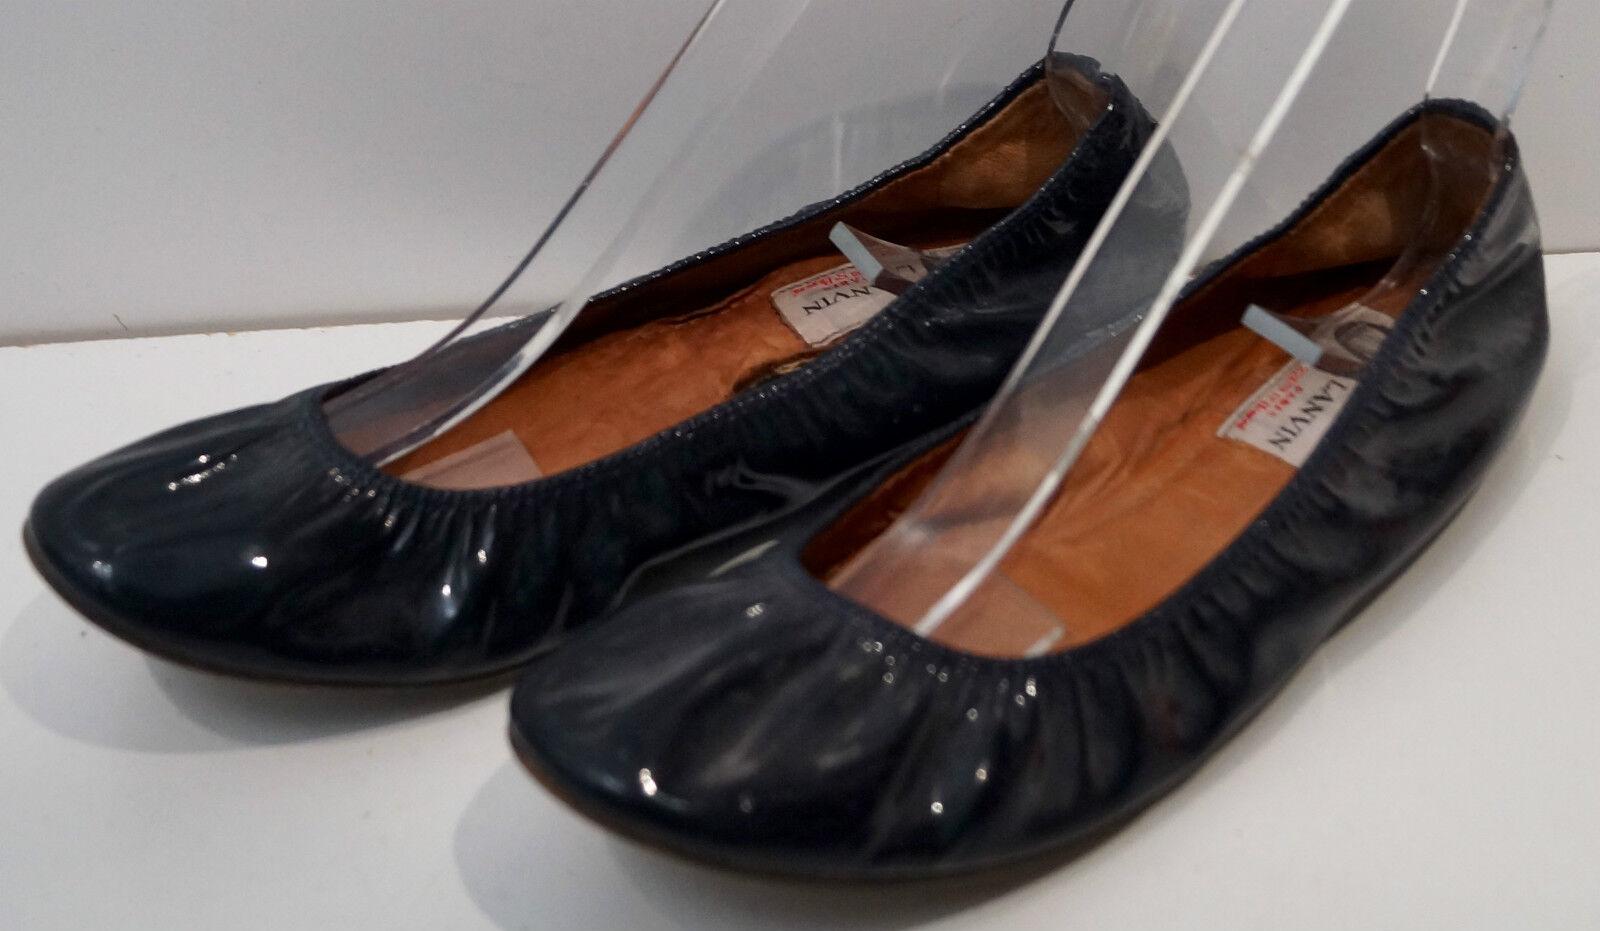 LANVIN Black Leather Patent Elastic Opening Flat Ballerina Pump shoes EU39 UK6